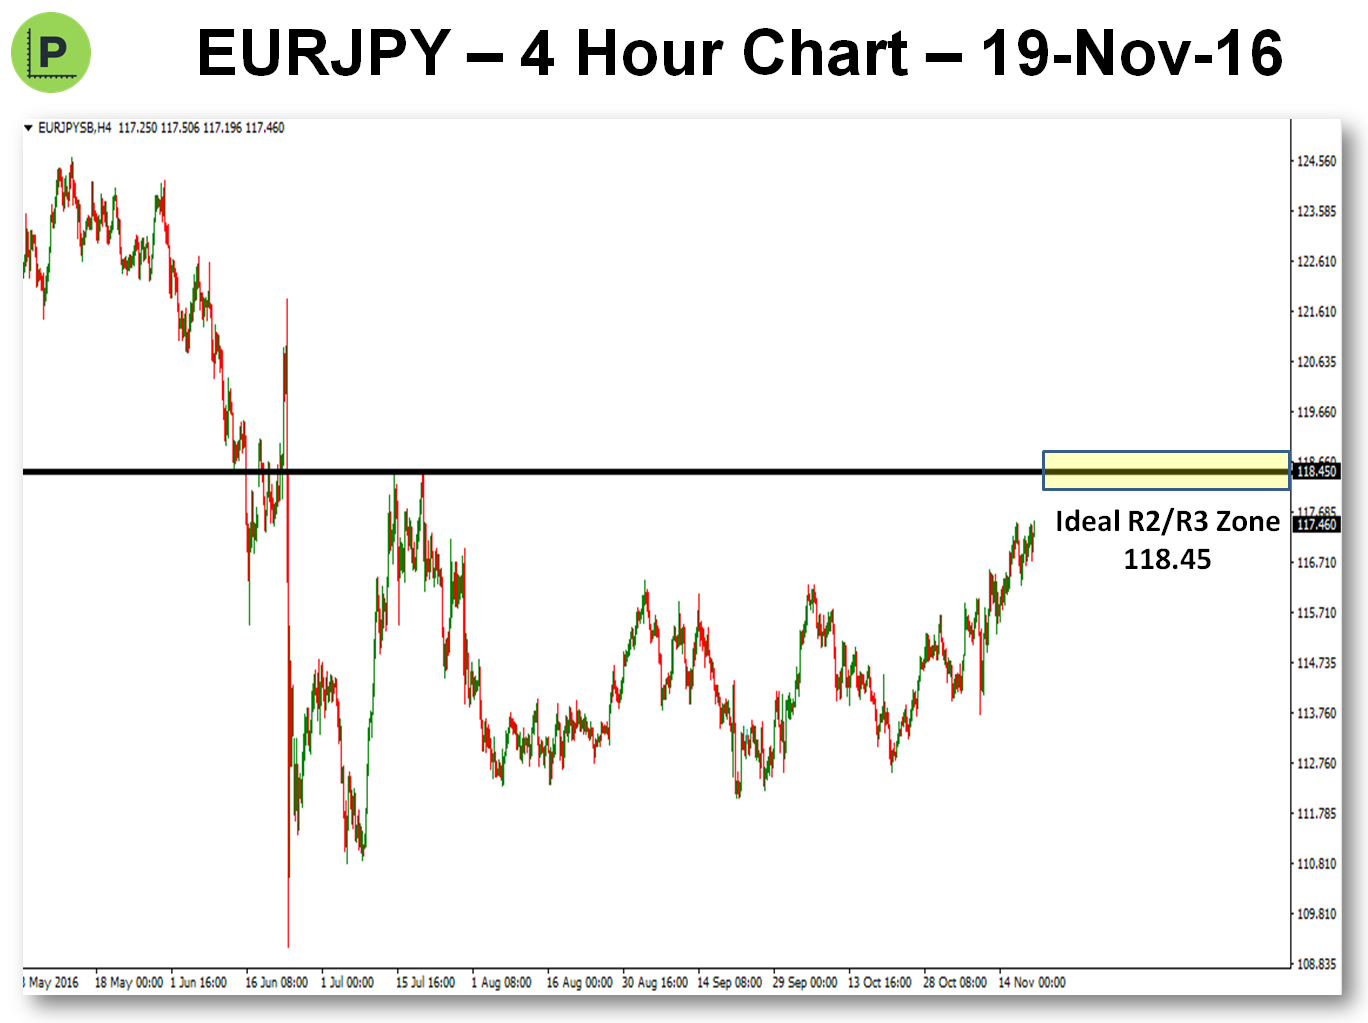 potential-pivot-trade-19-nov-16-eurjpy